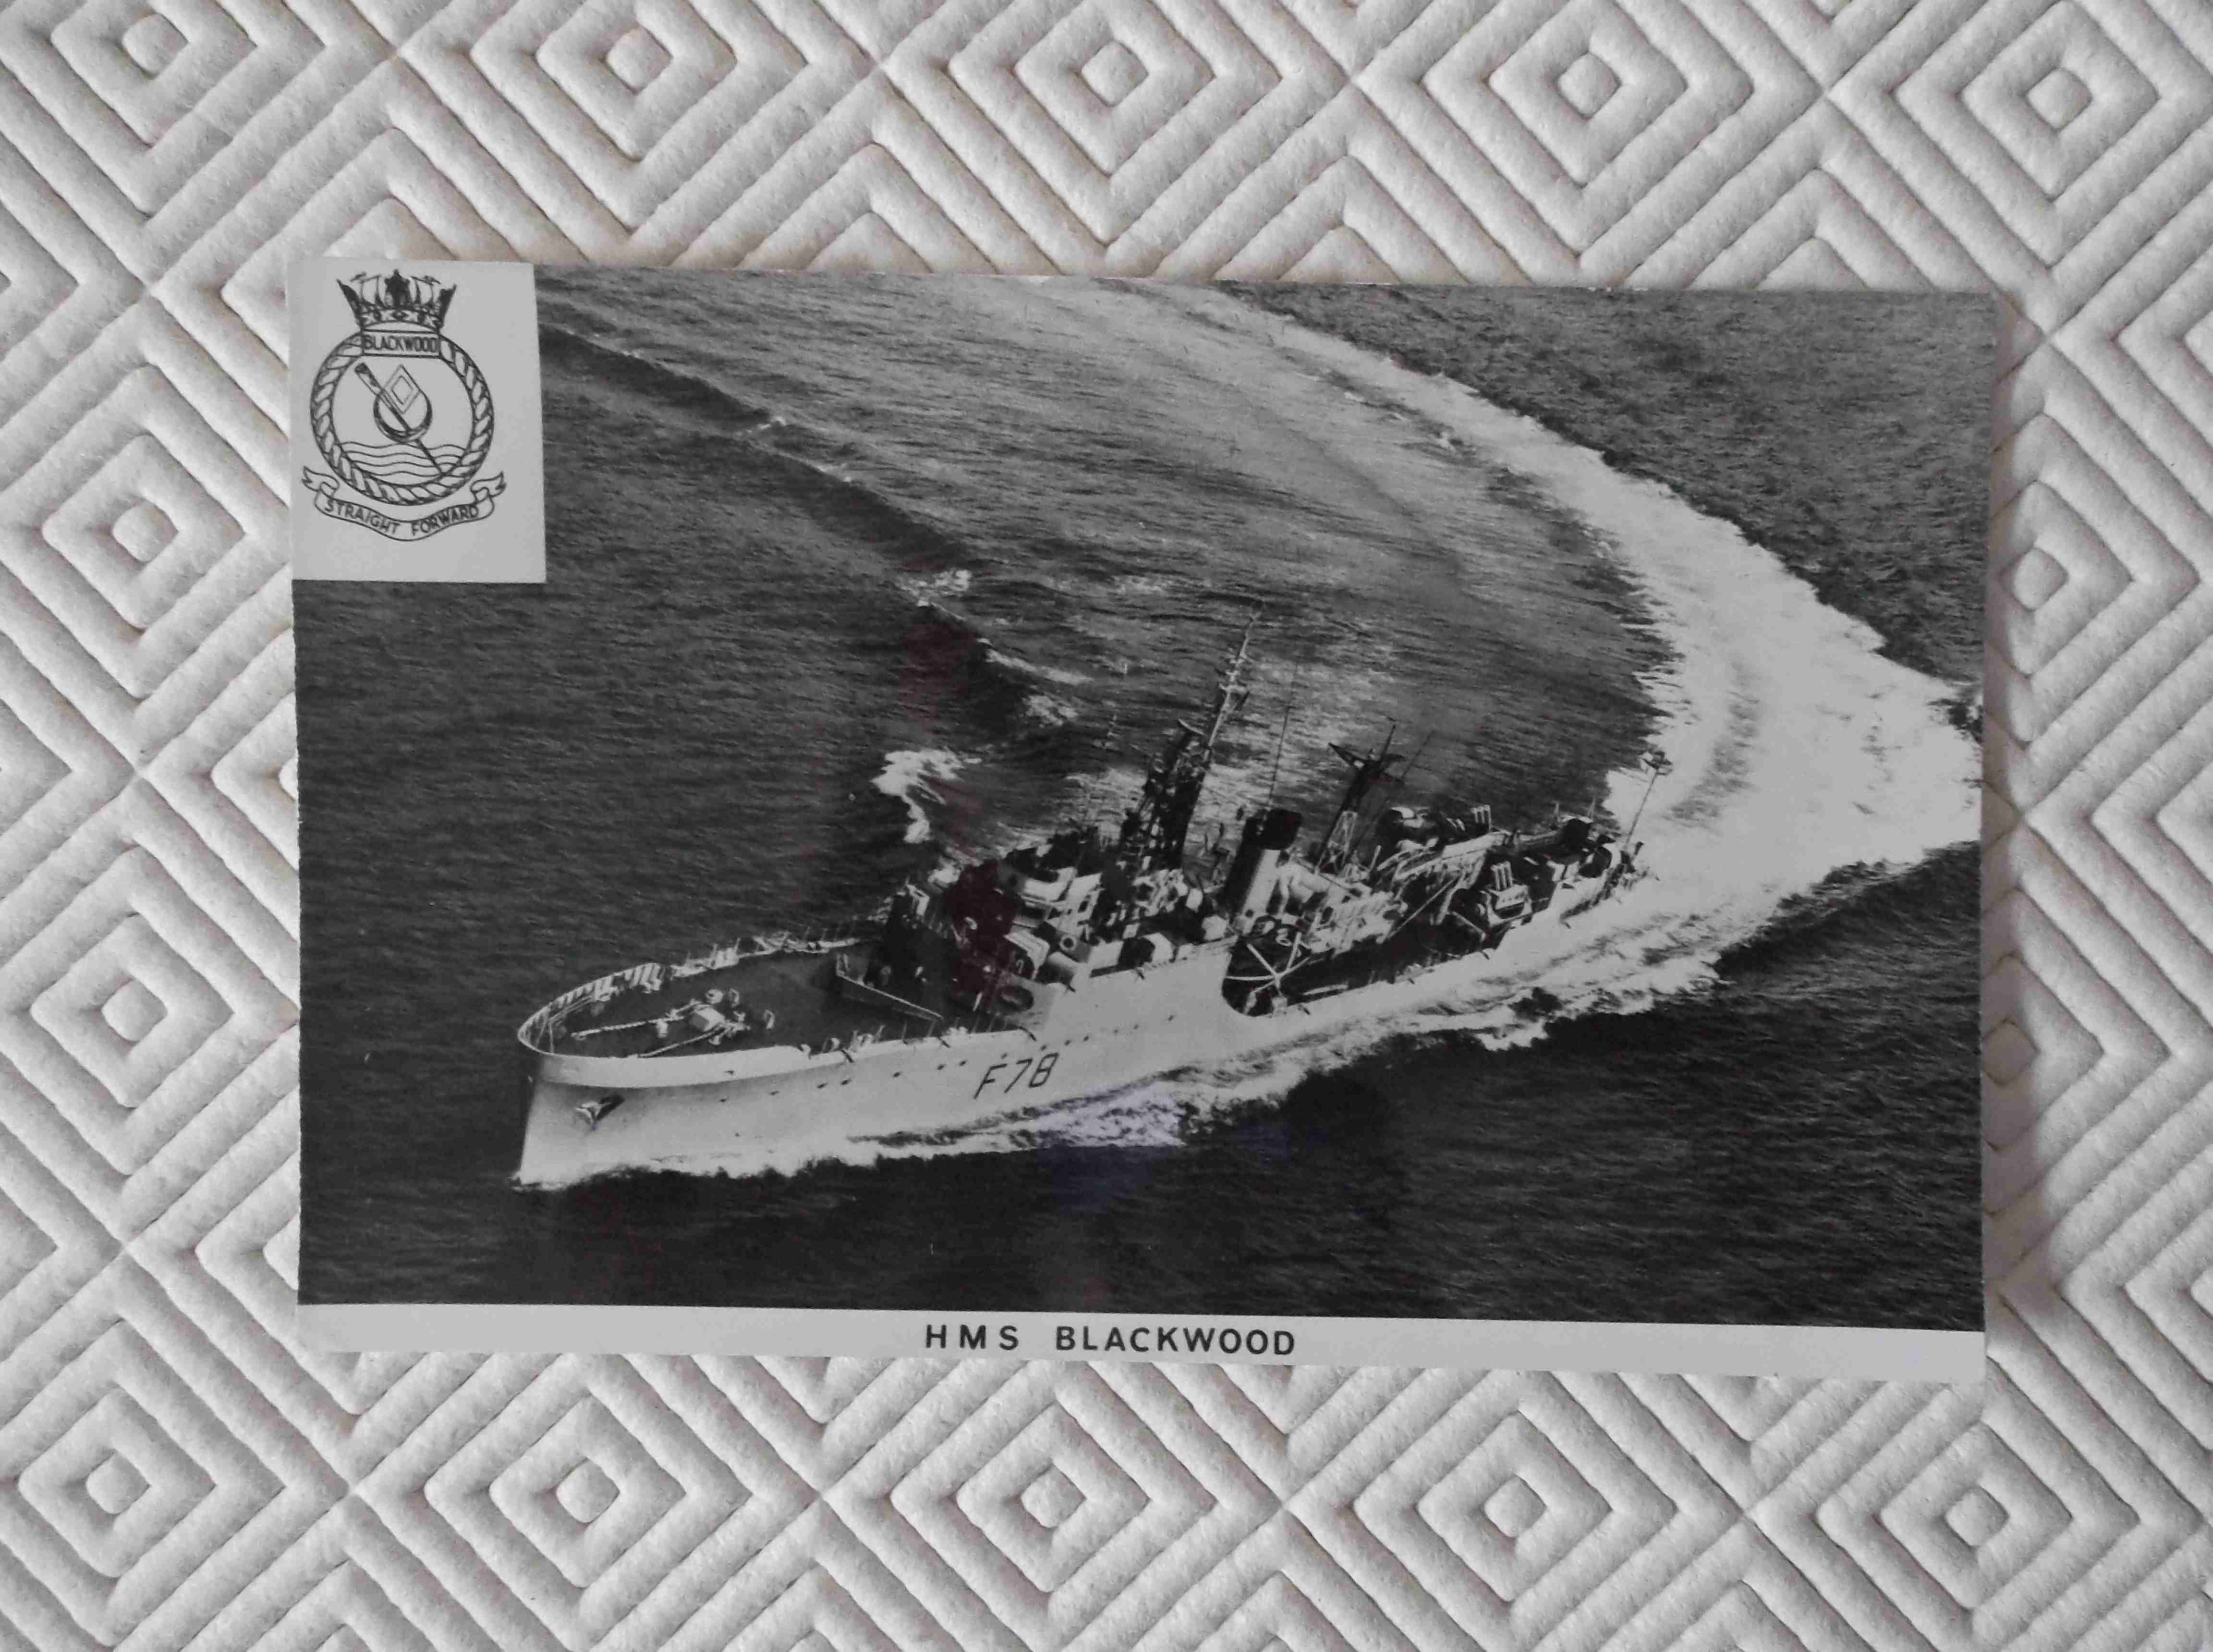 POSTCARD SIZE PHOTOGRAPH OF THE ROYAL NAVAL VESSEL HMS BLACKWOOD